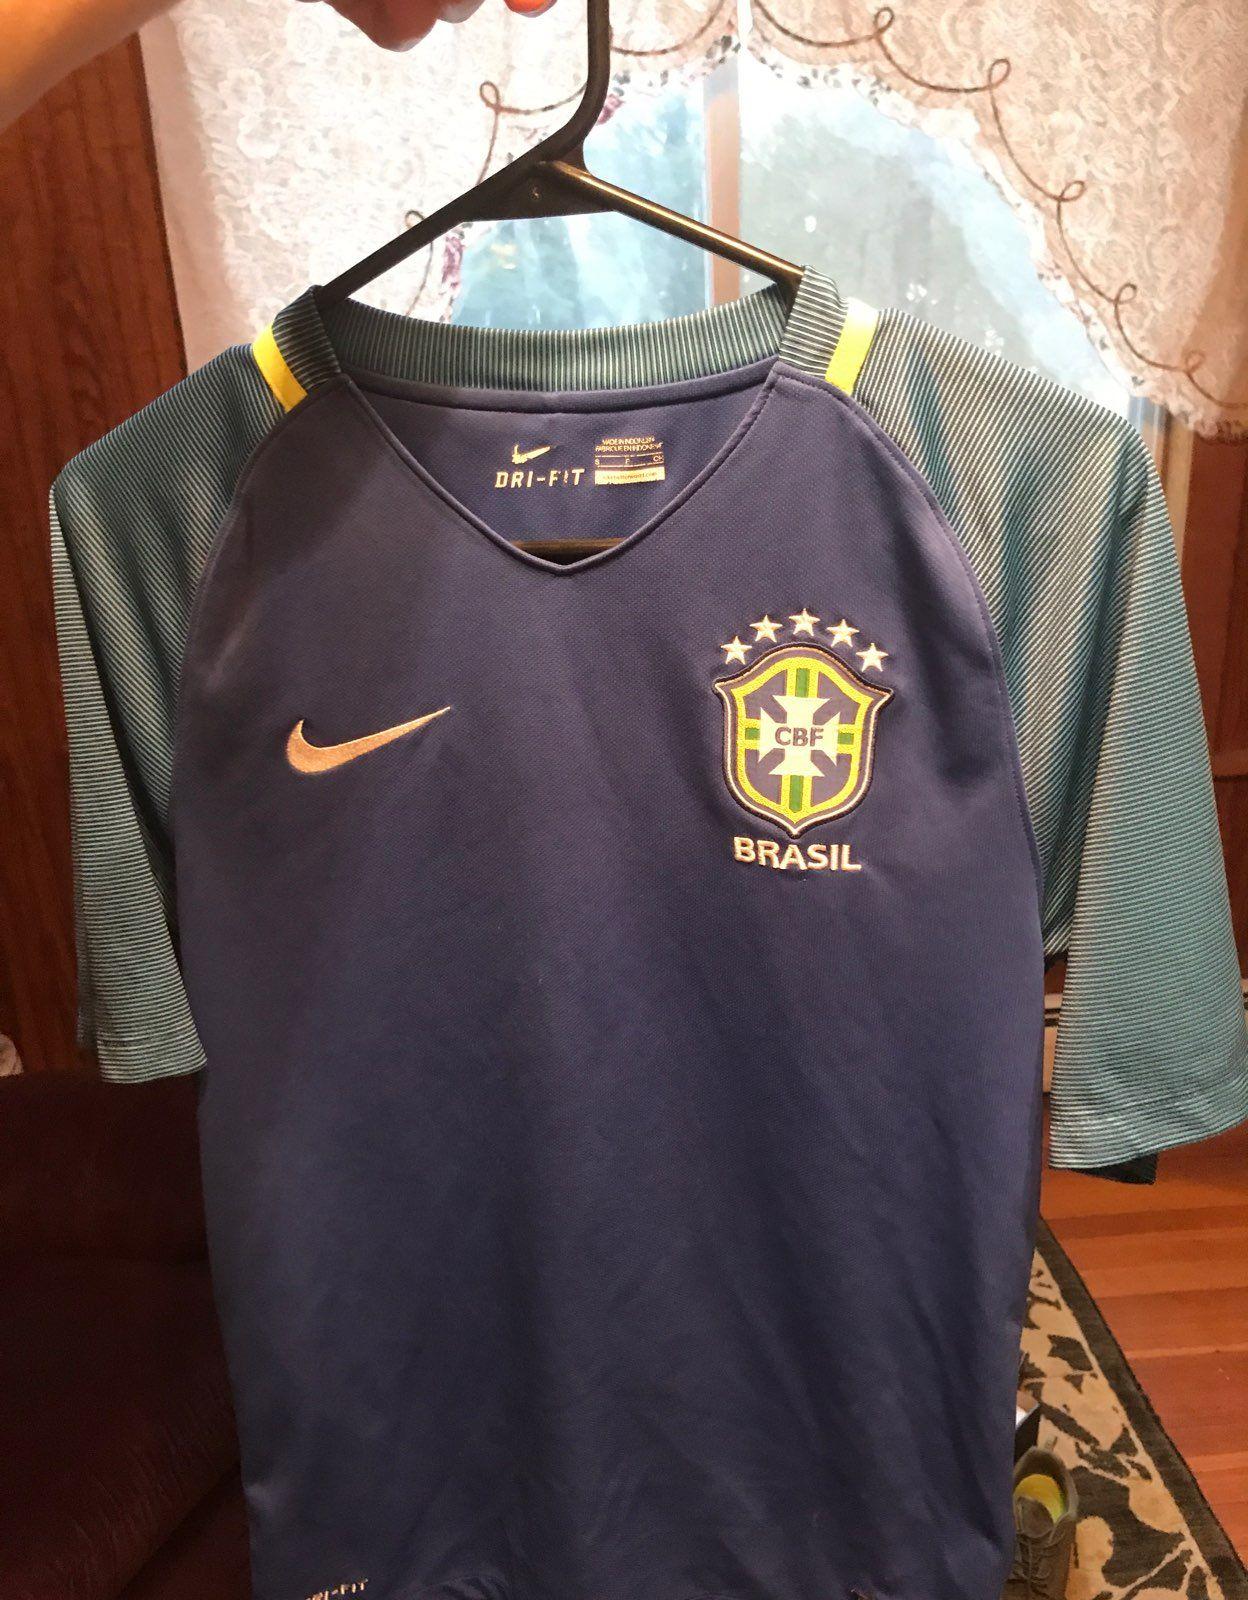 CBF Brasil Jersey